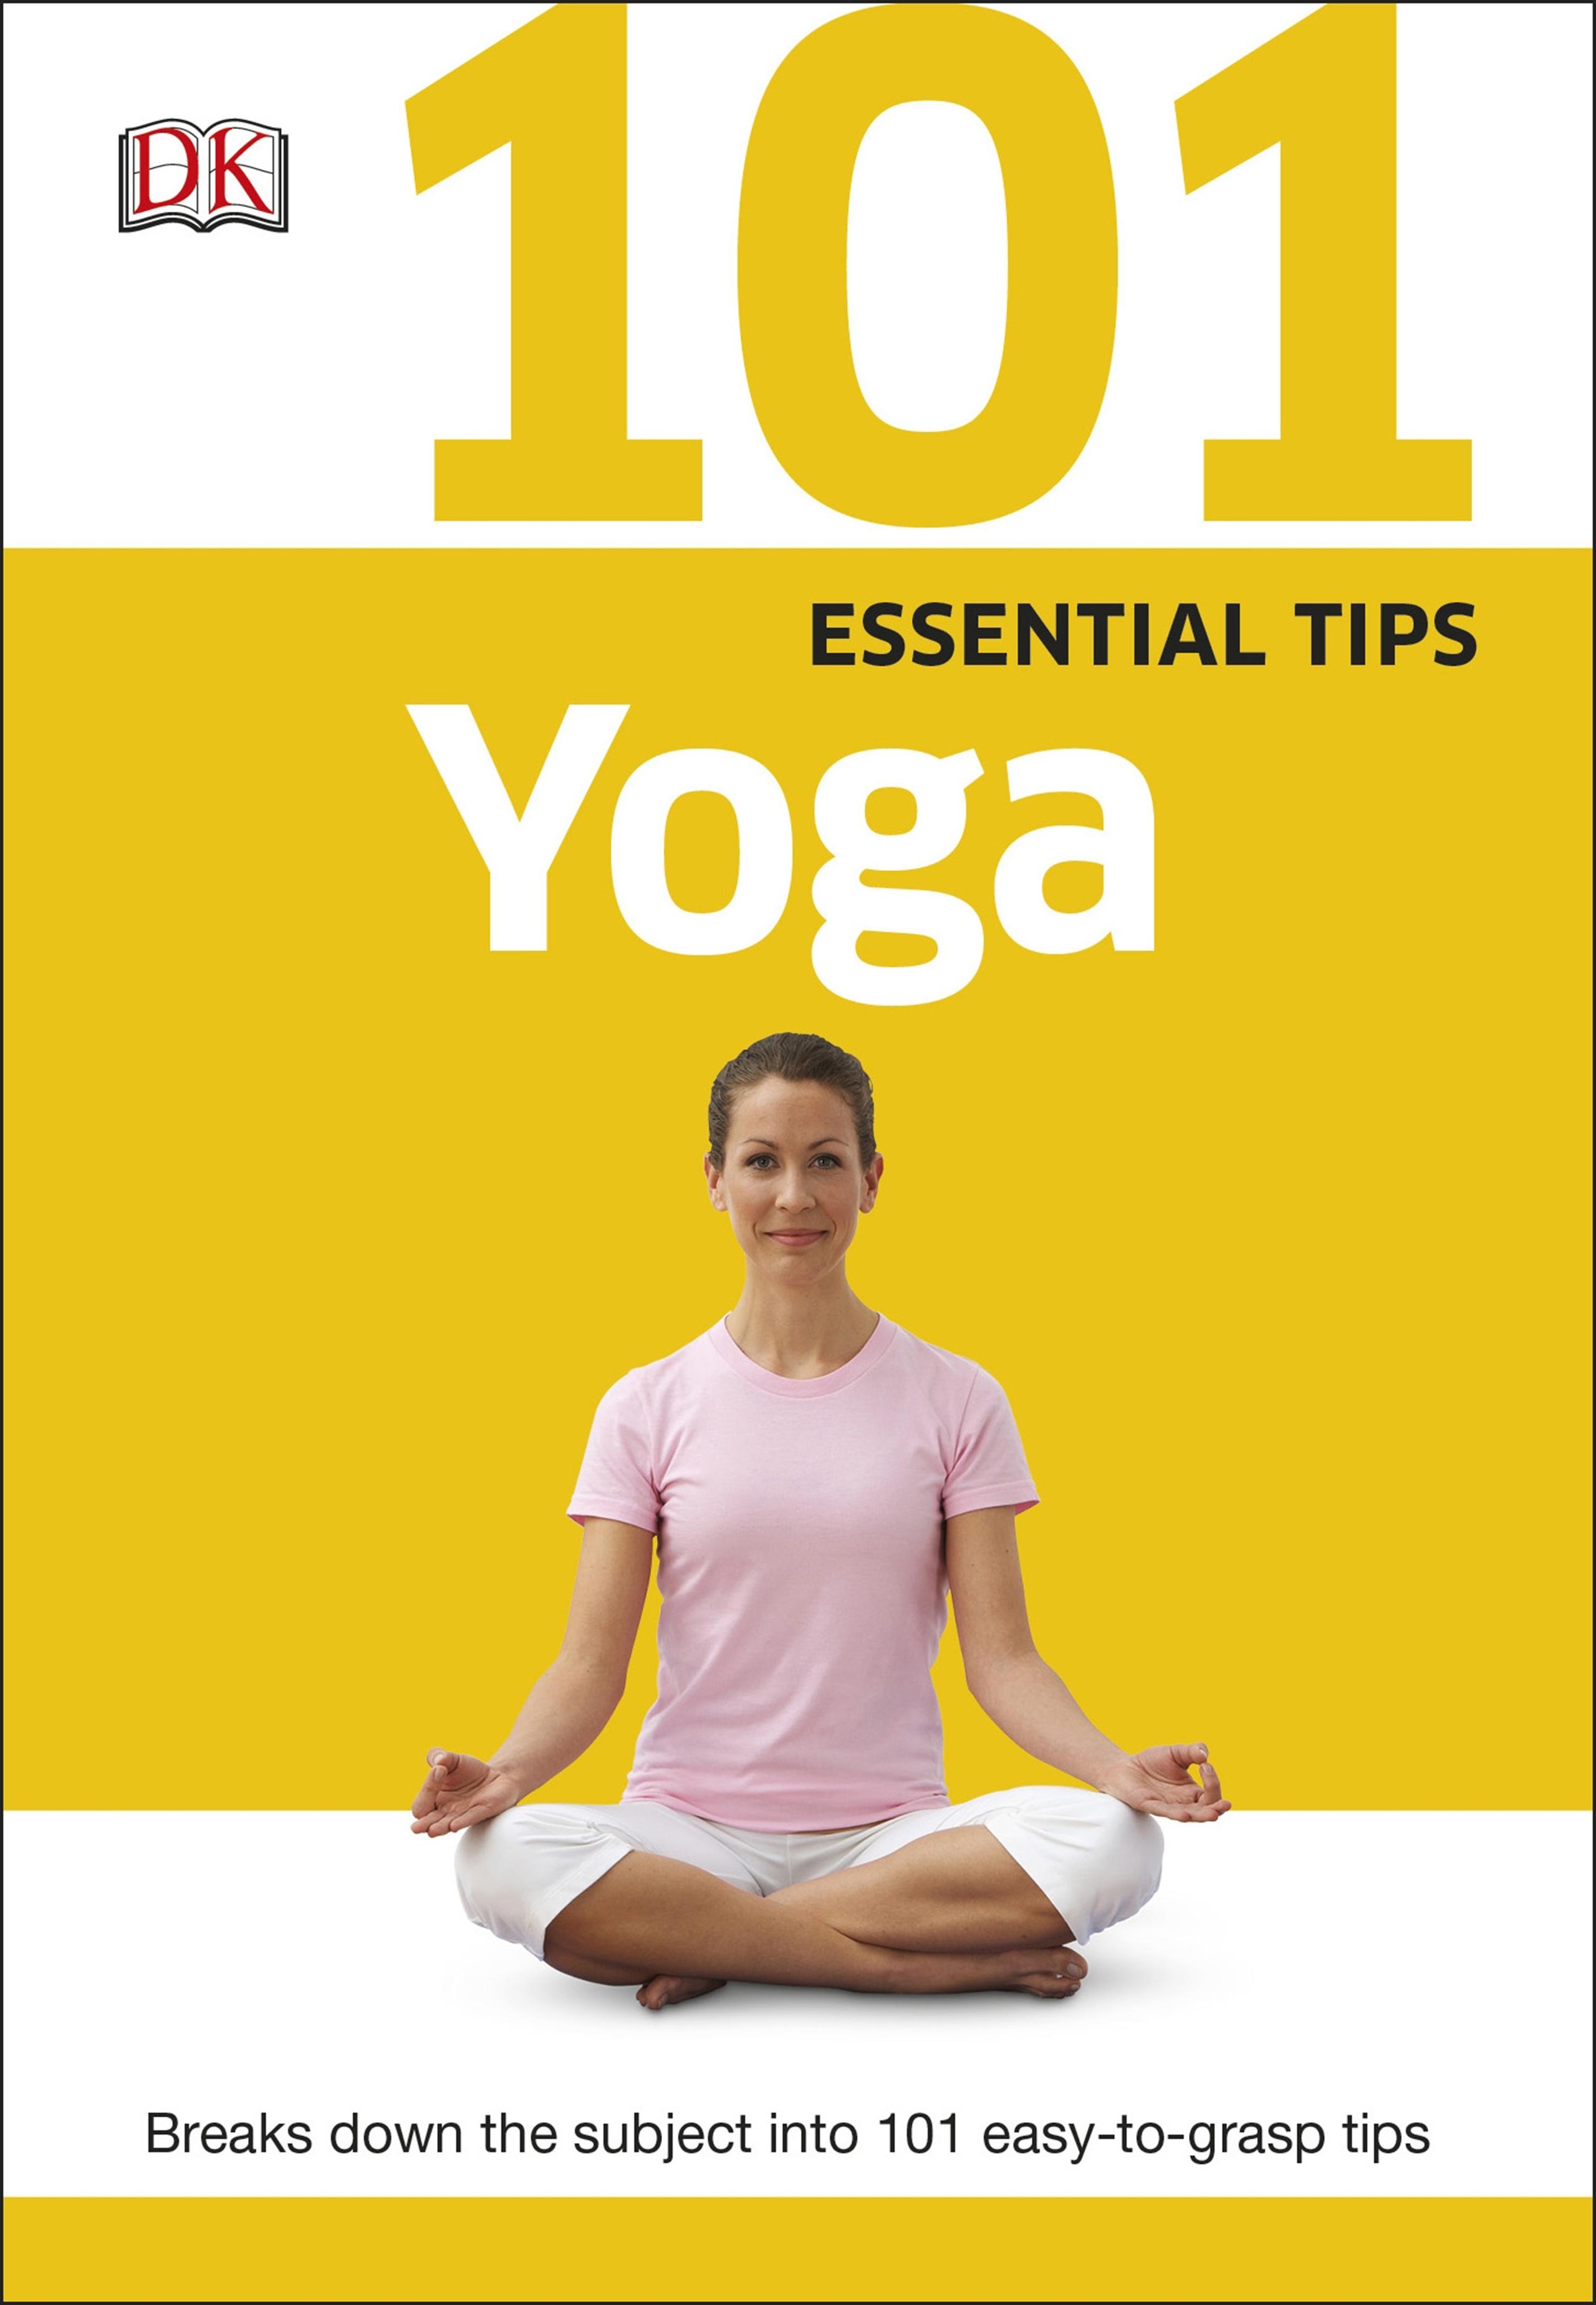 101 Essential Tips: Yoga